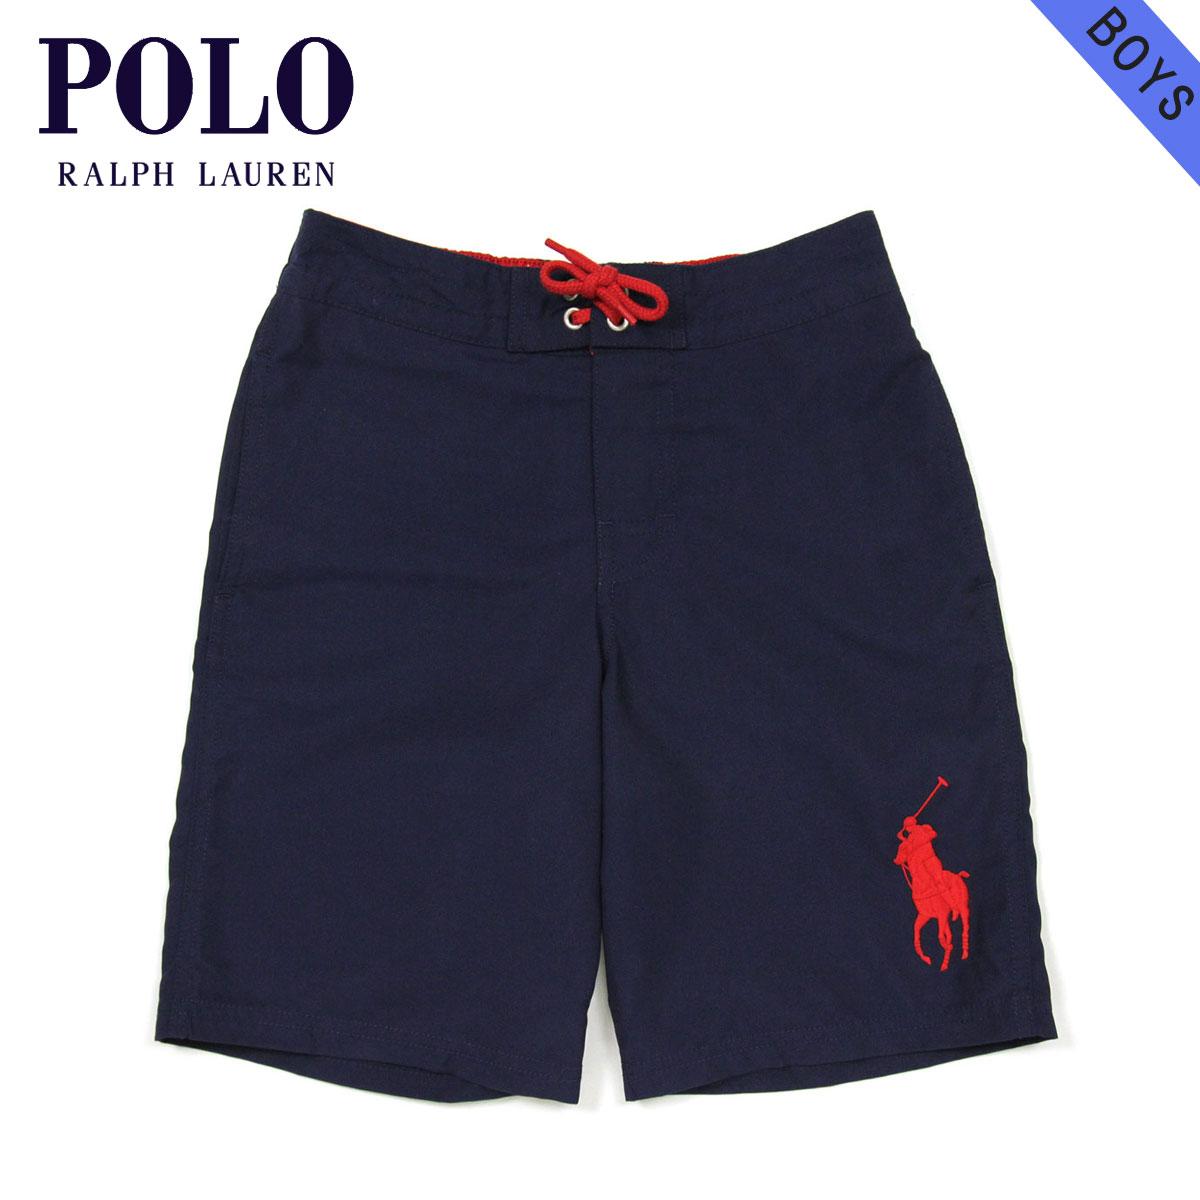 3d68b68cc9 Polo Ralph Lauren kids POLO RALPH LAUREN CHILDREN regular article  children's clothes Boys swimming underwear swimsuit SWIM TRUNK